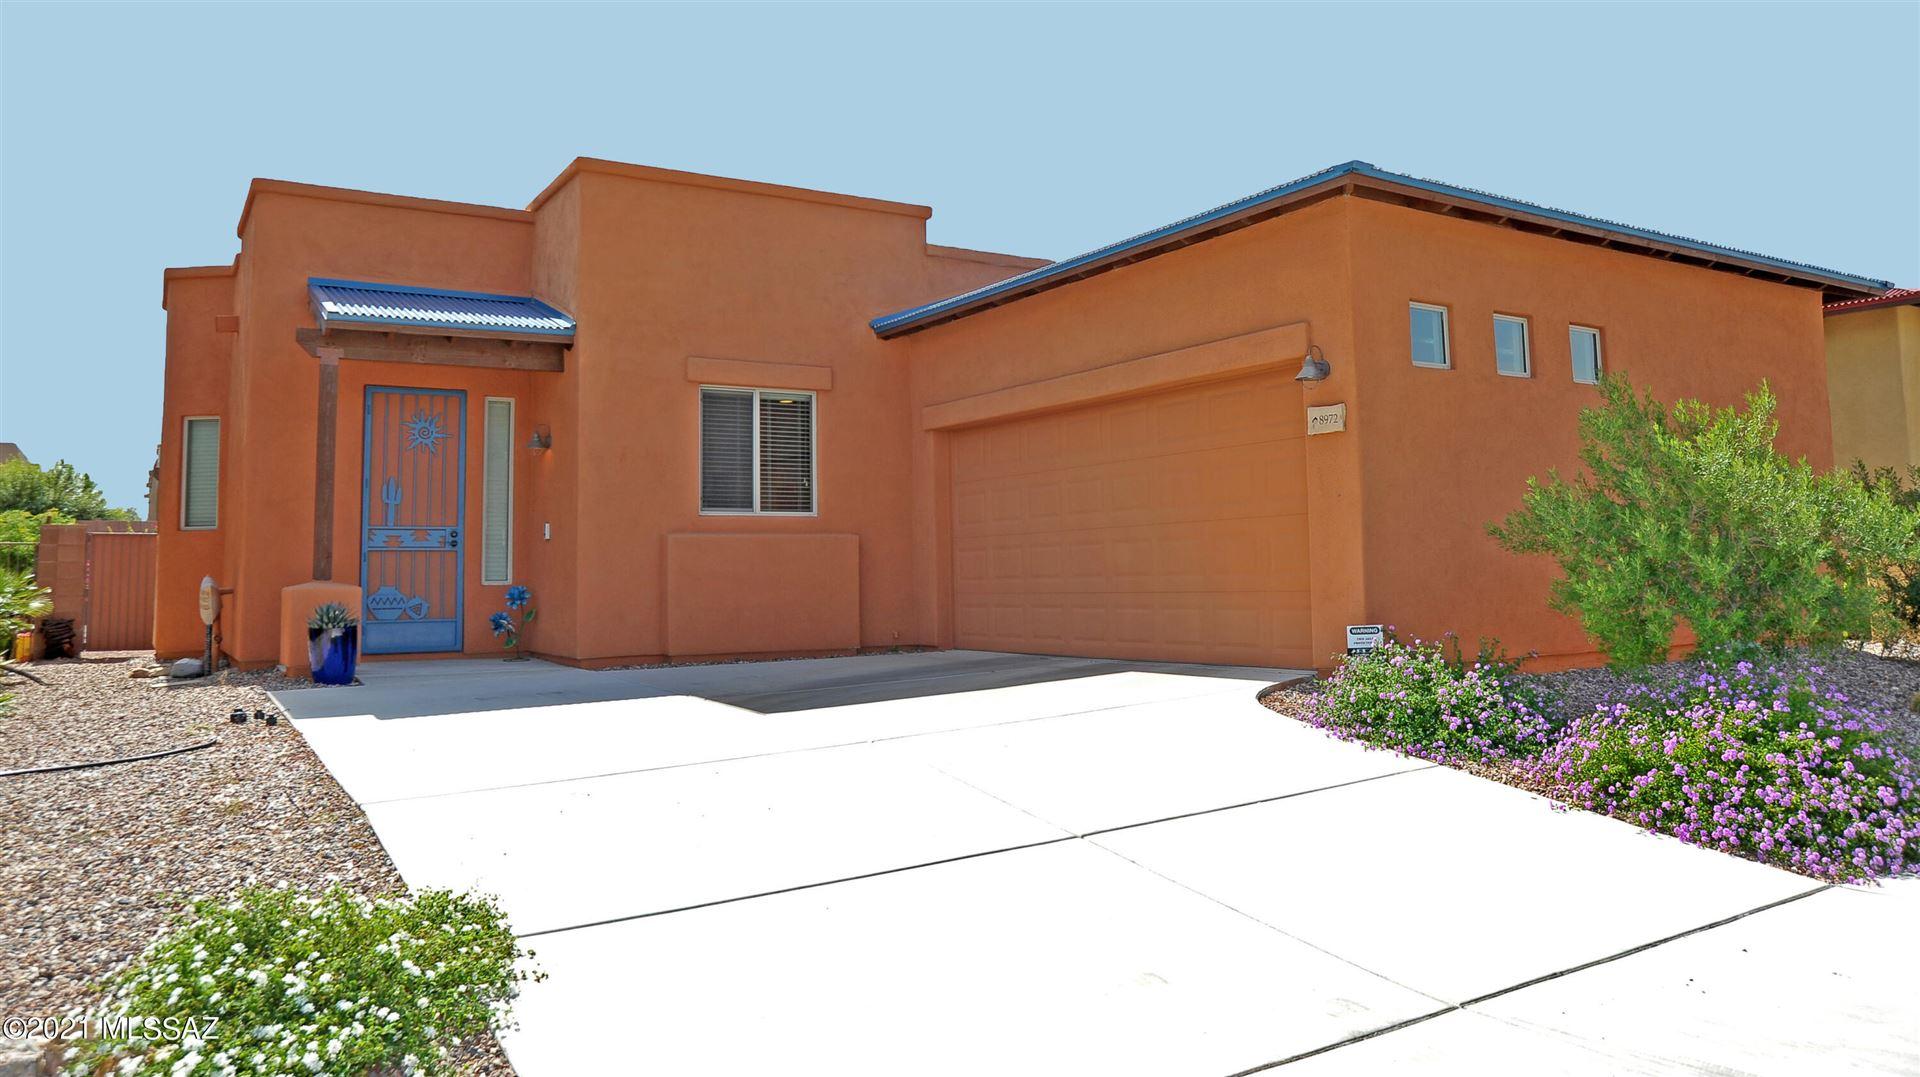 8972 E Wright School Loop, Tucson, AZ 85715 - #: 22127138